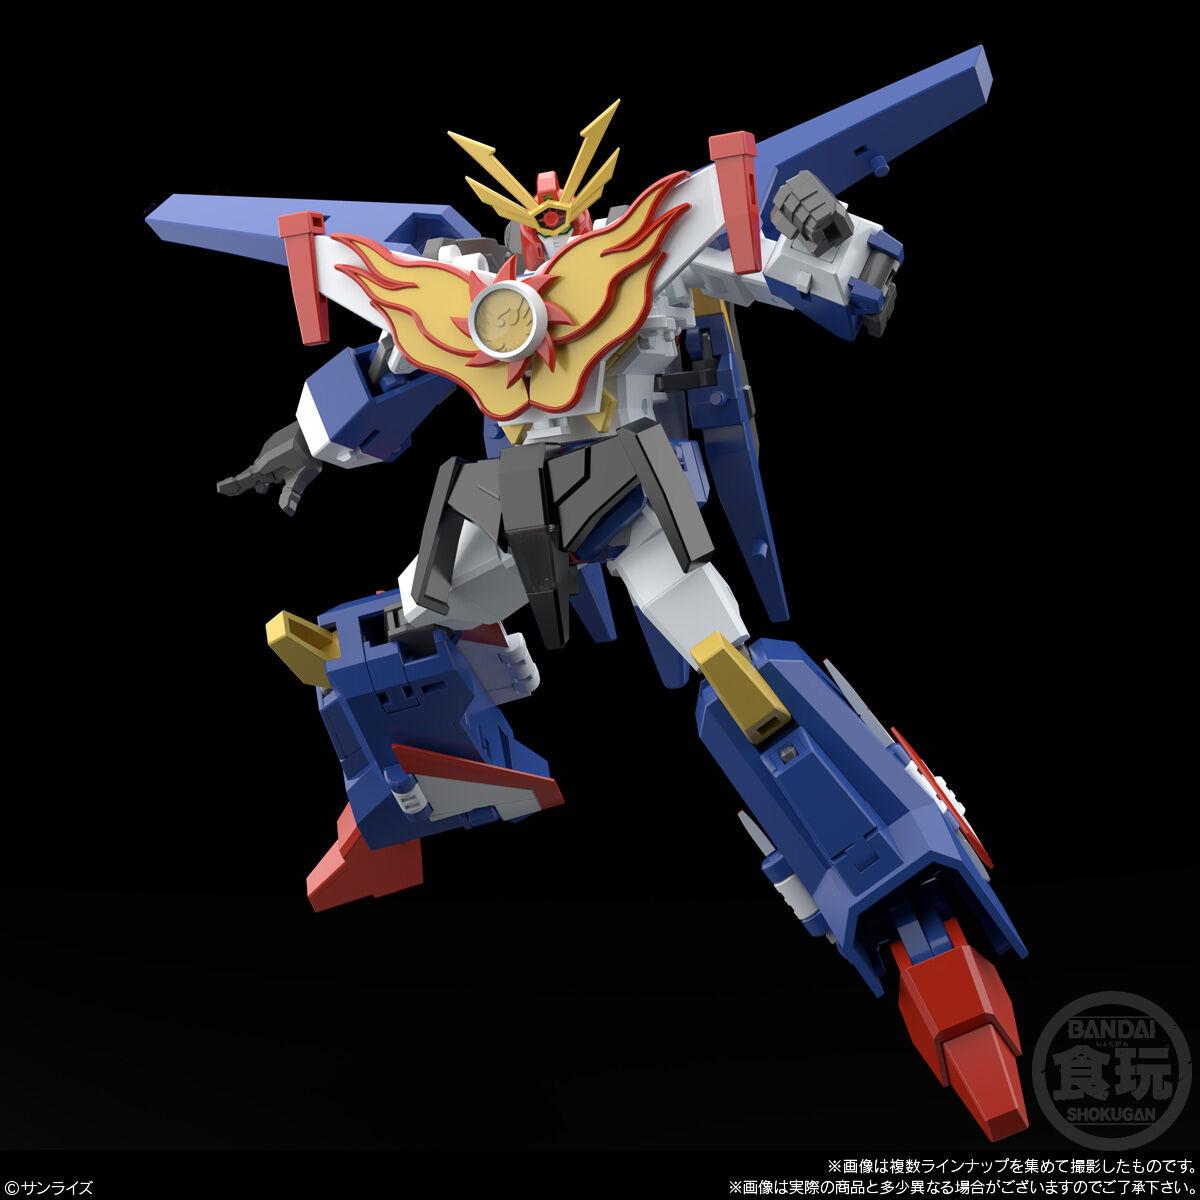 SMP [SHOKUGAN MODELING PROJECT] 太陽の勇者ファイバード_5